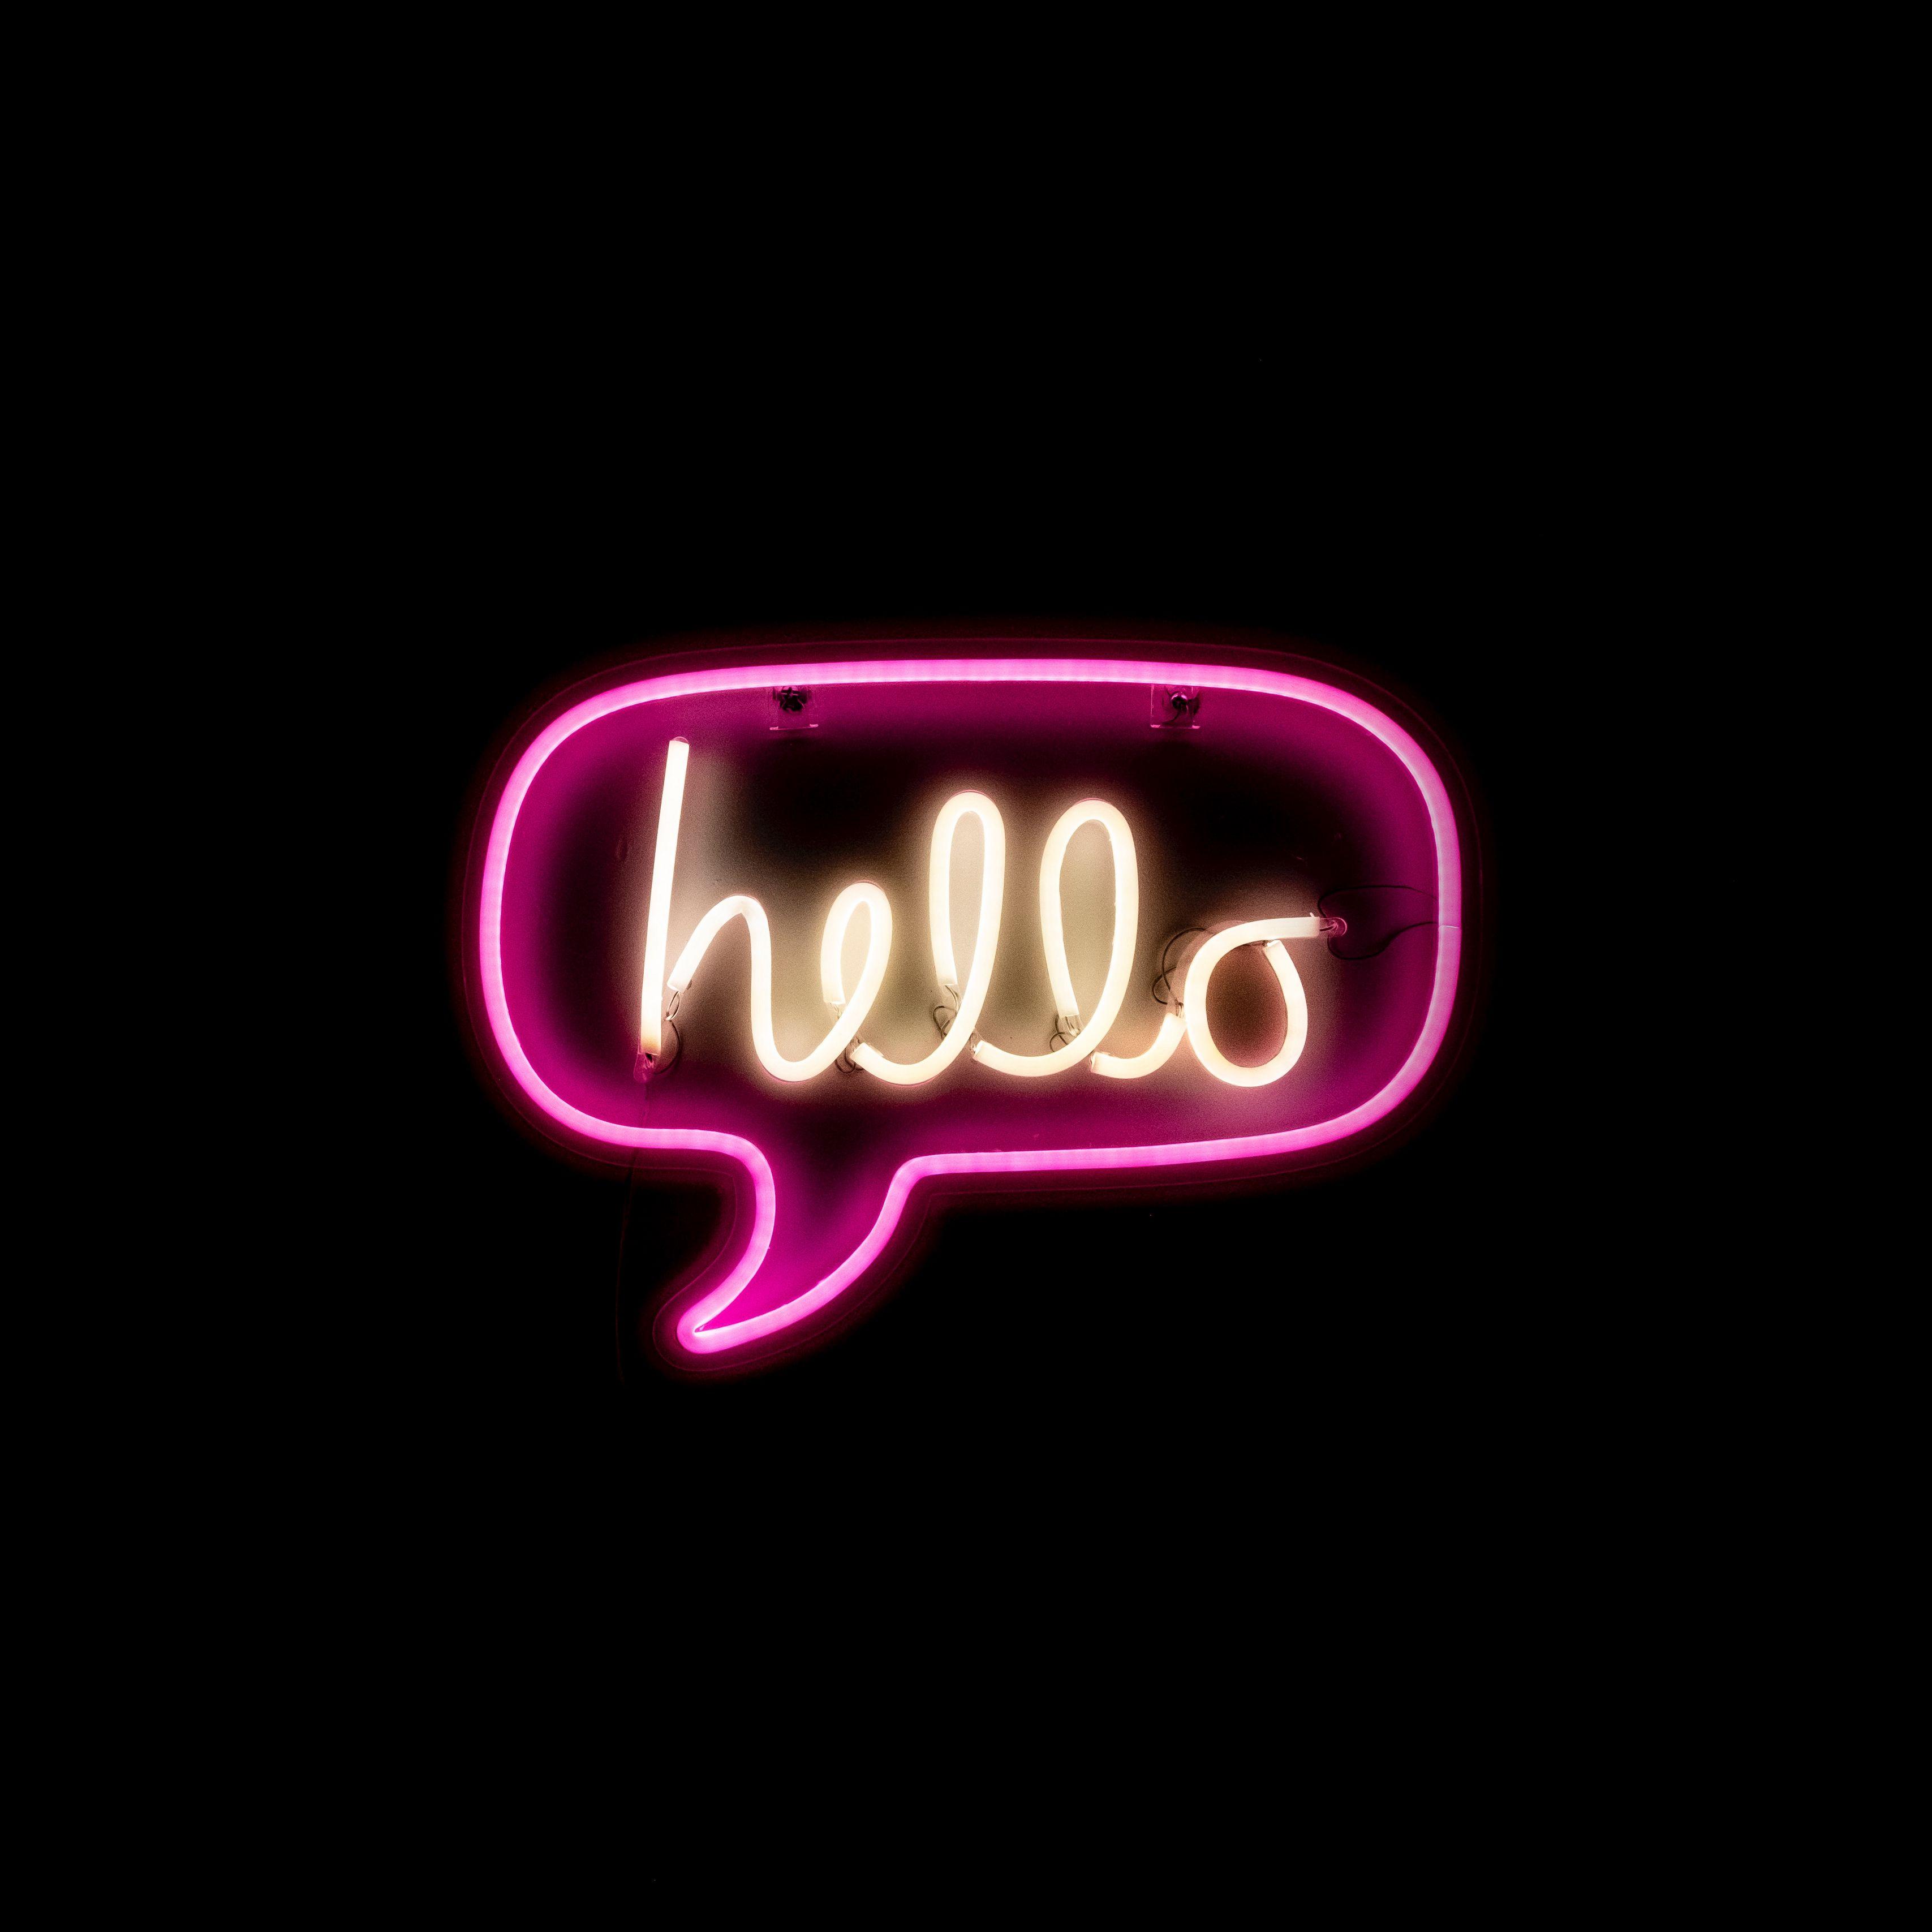 3415x3415 Wallpaper hello, neon, inscription, text